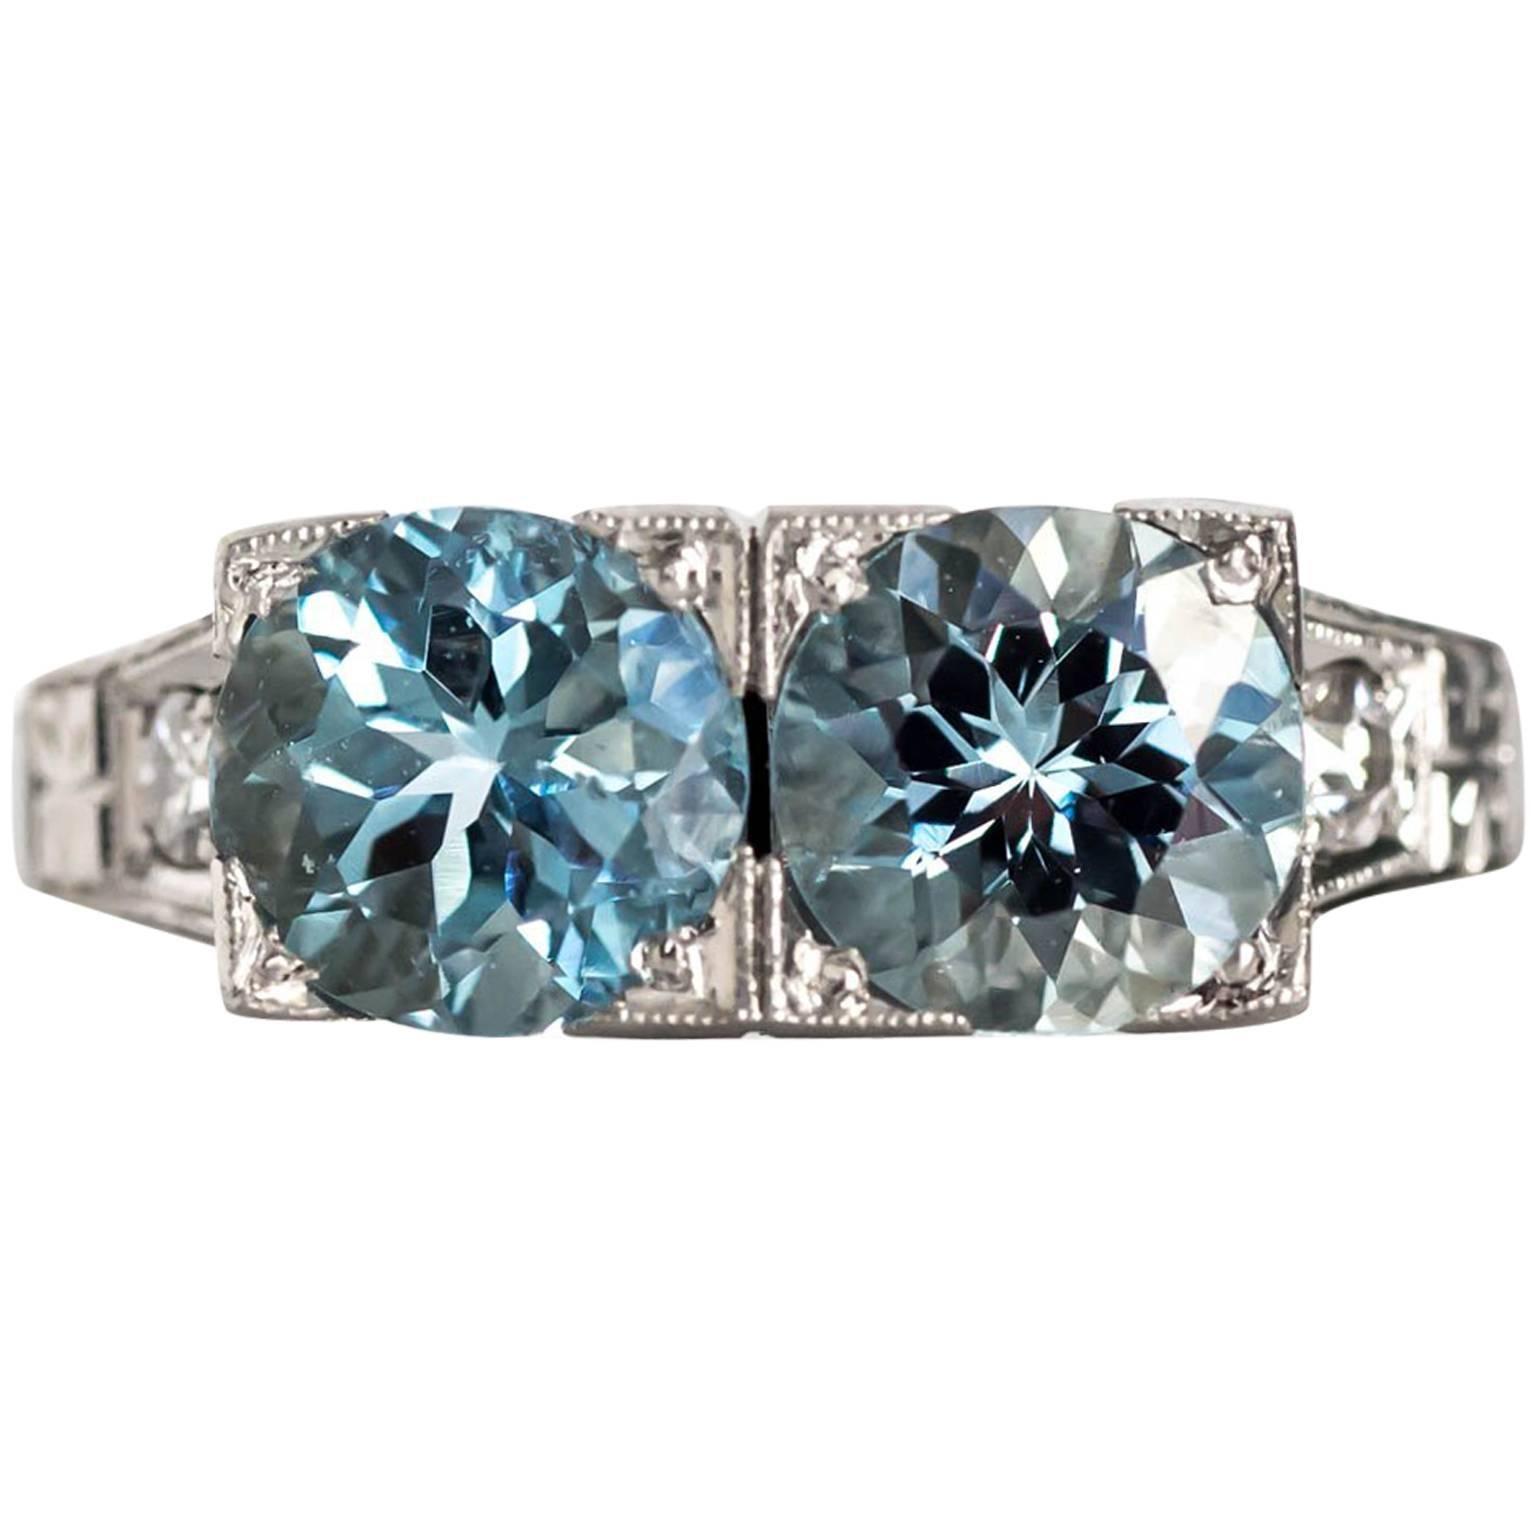 1930s Art Deco Platinum London Blue Topaz and Diamond Engagement Ring